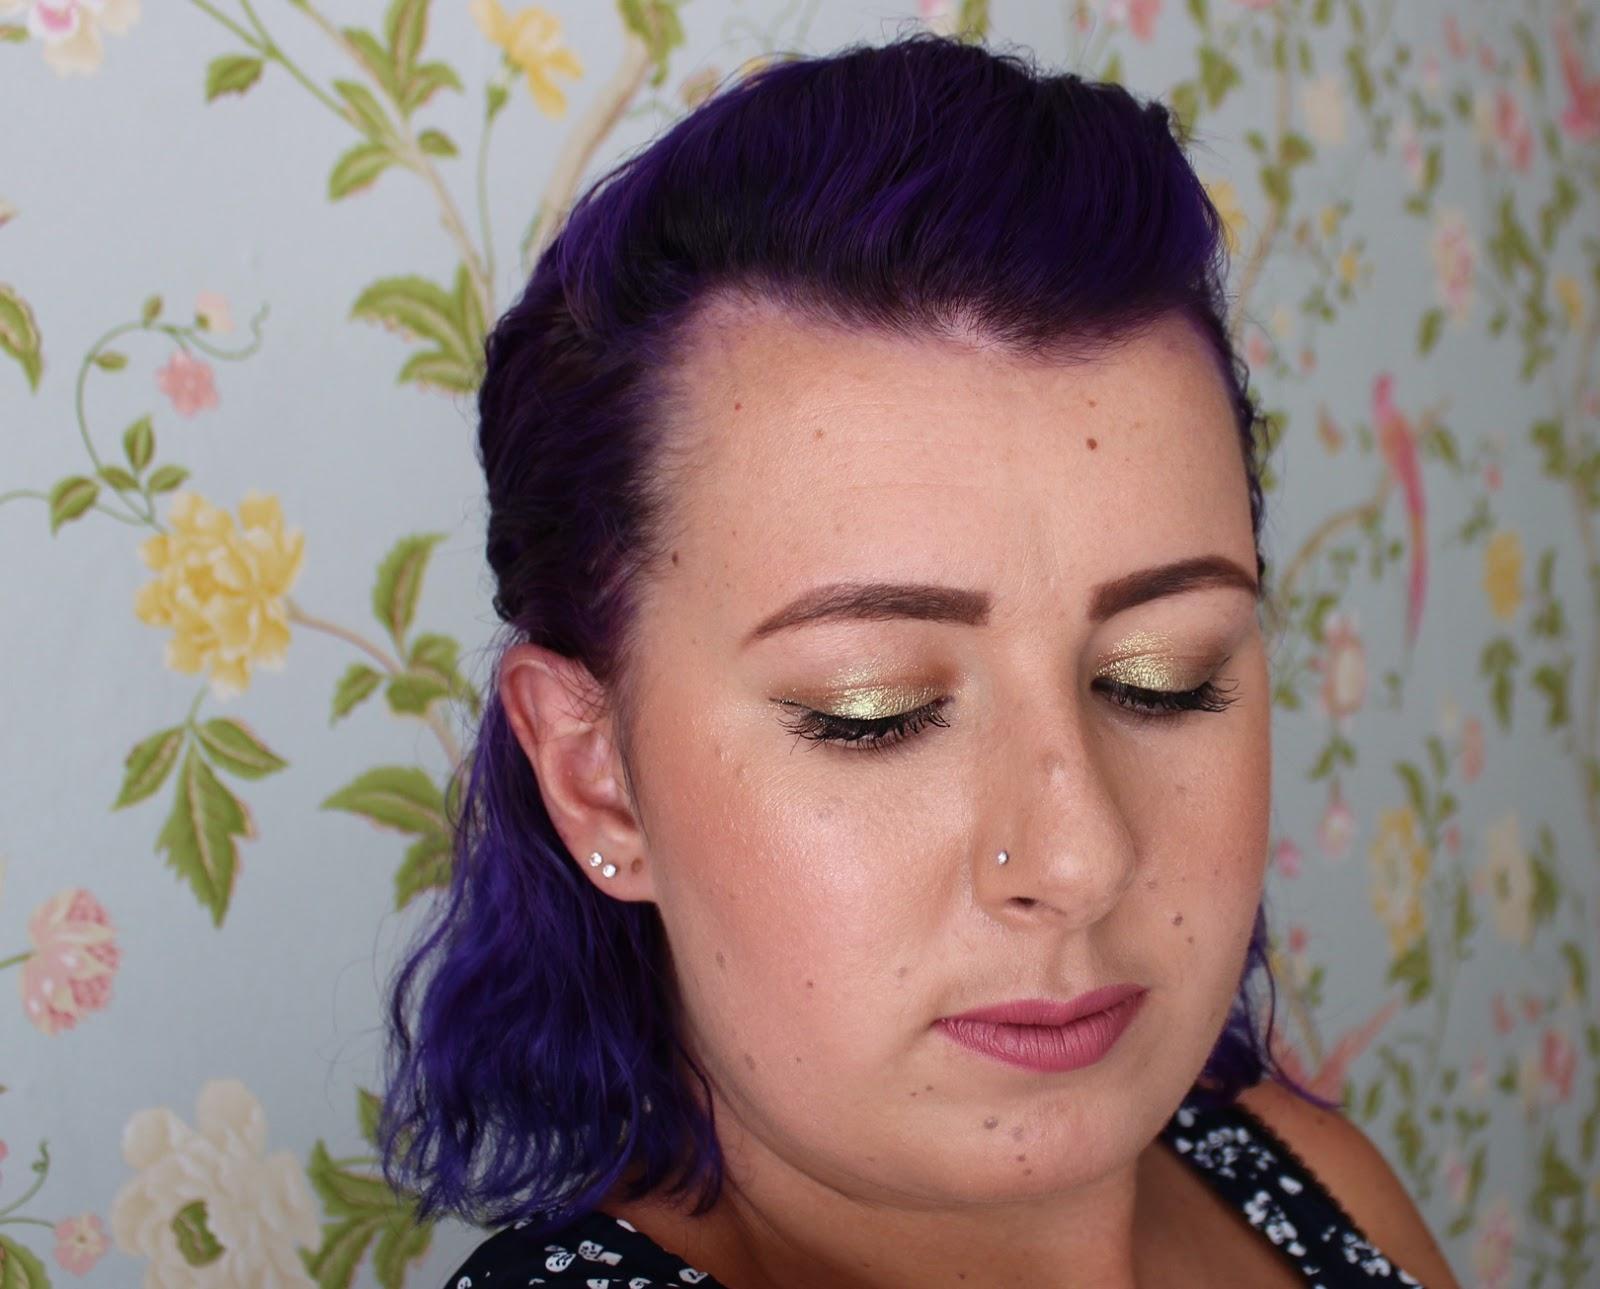 Urban Decay Moondust Eyeshadow review swatch